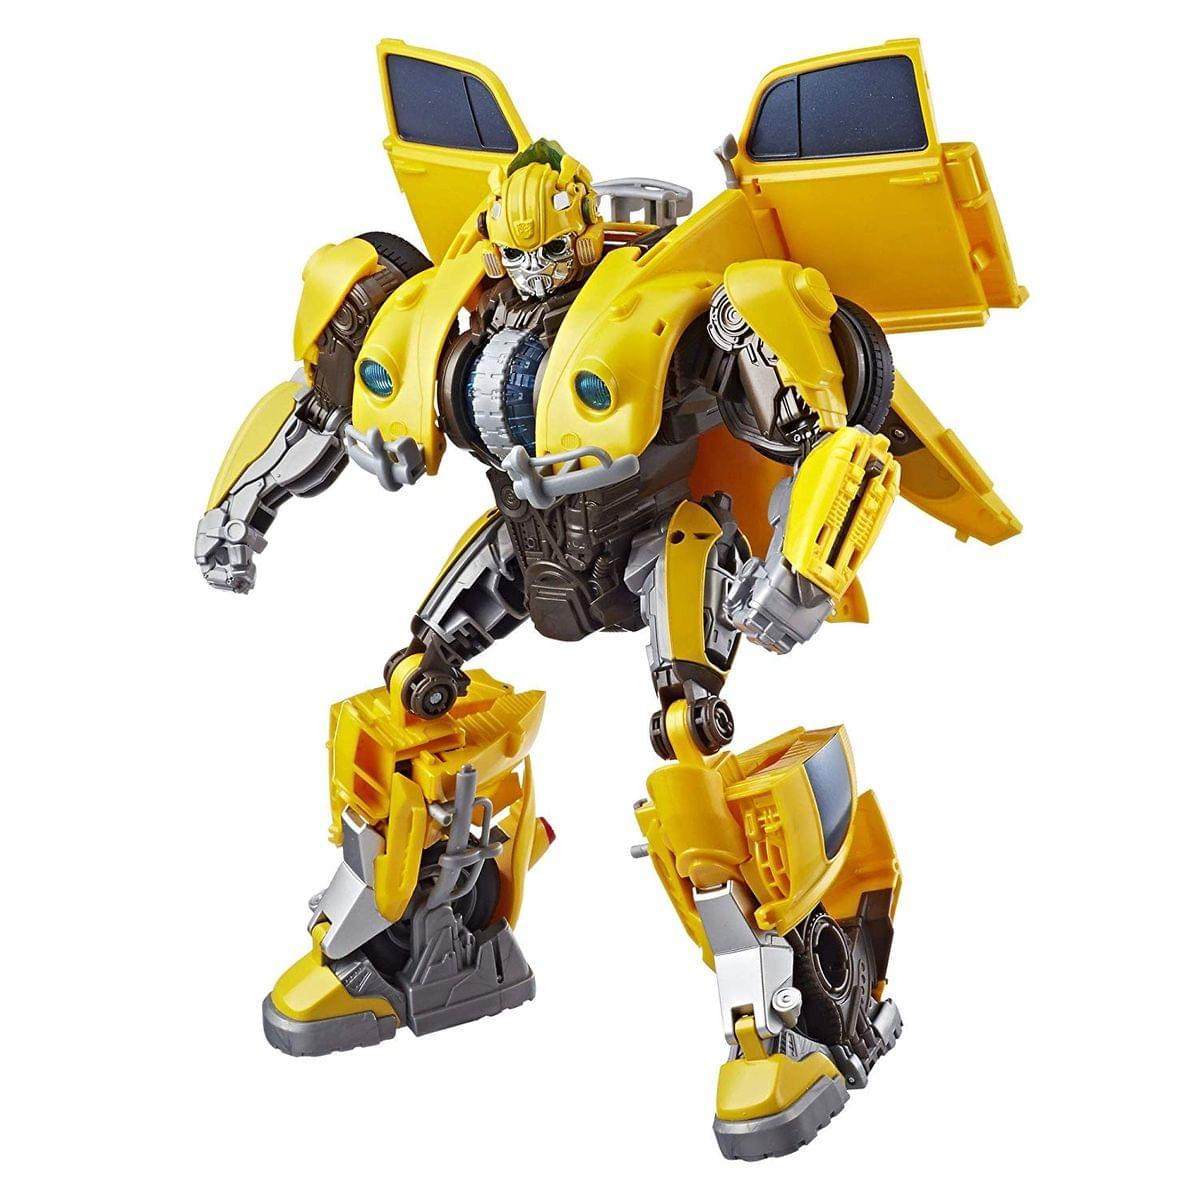 Transformers Bumblebee Power Charge Bumblebee